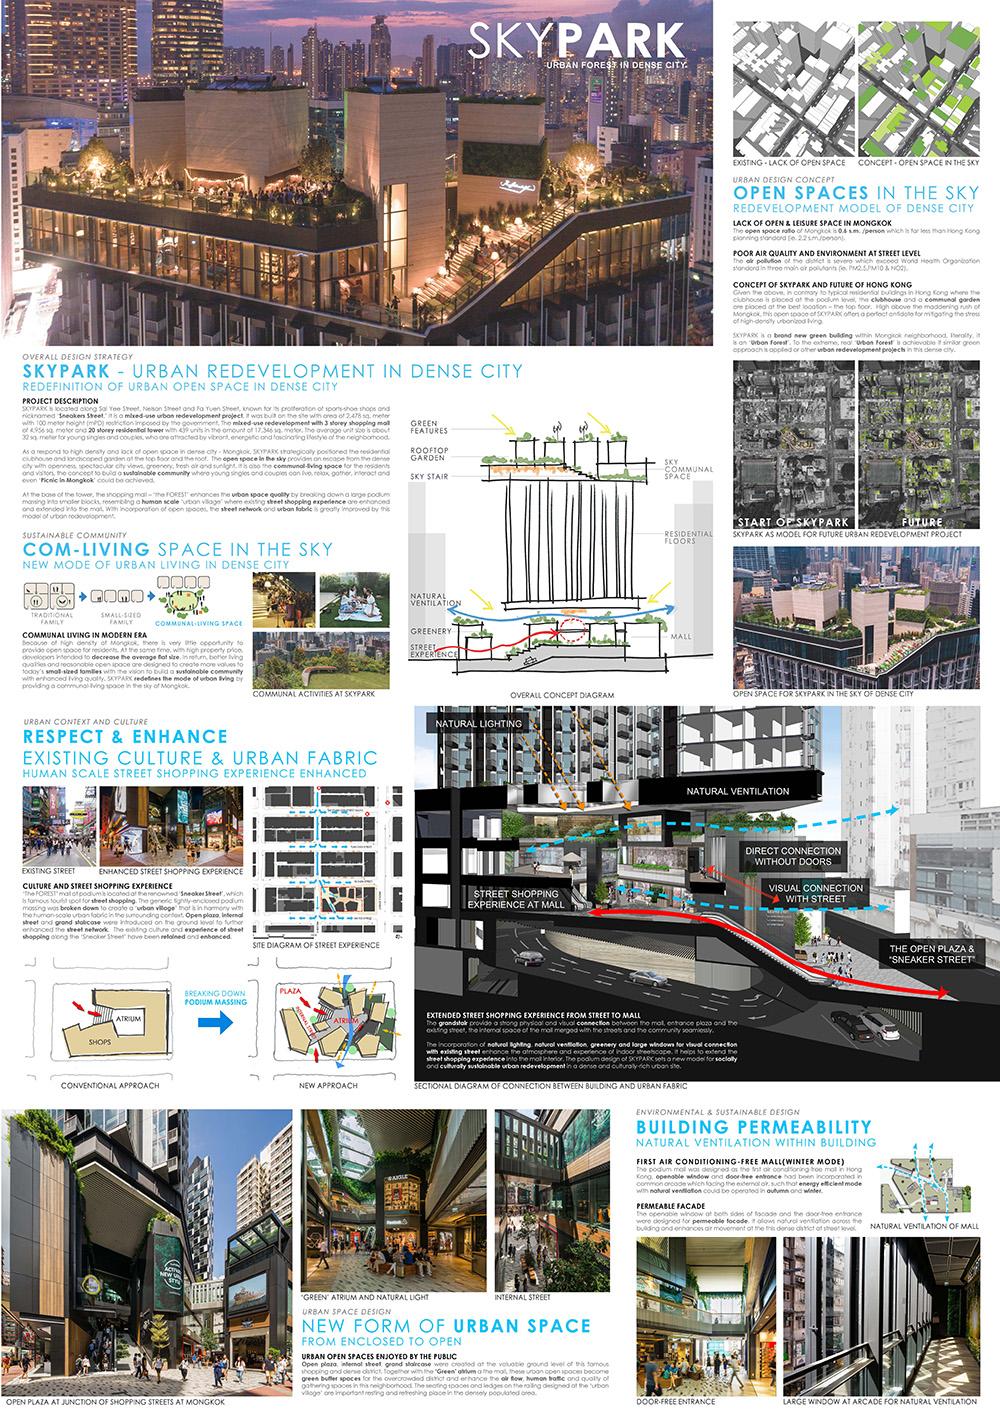 HKIUD Urban Design Awards